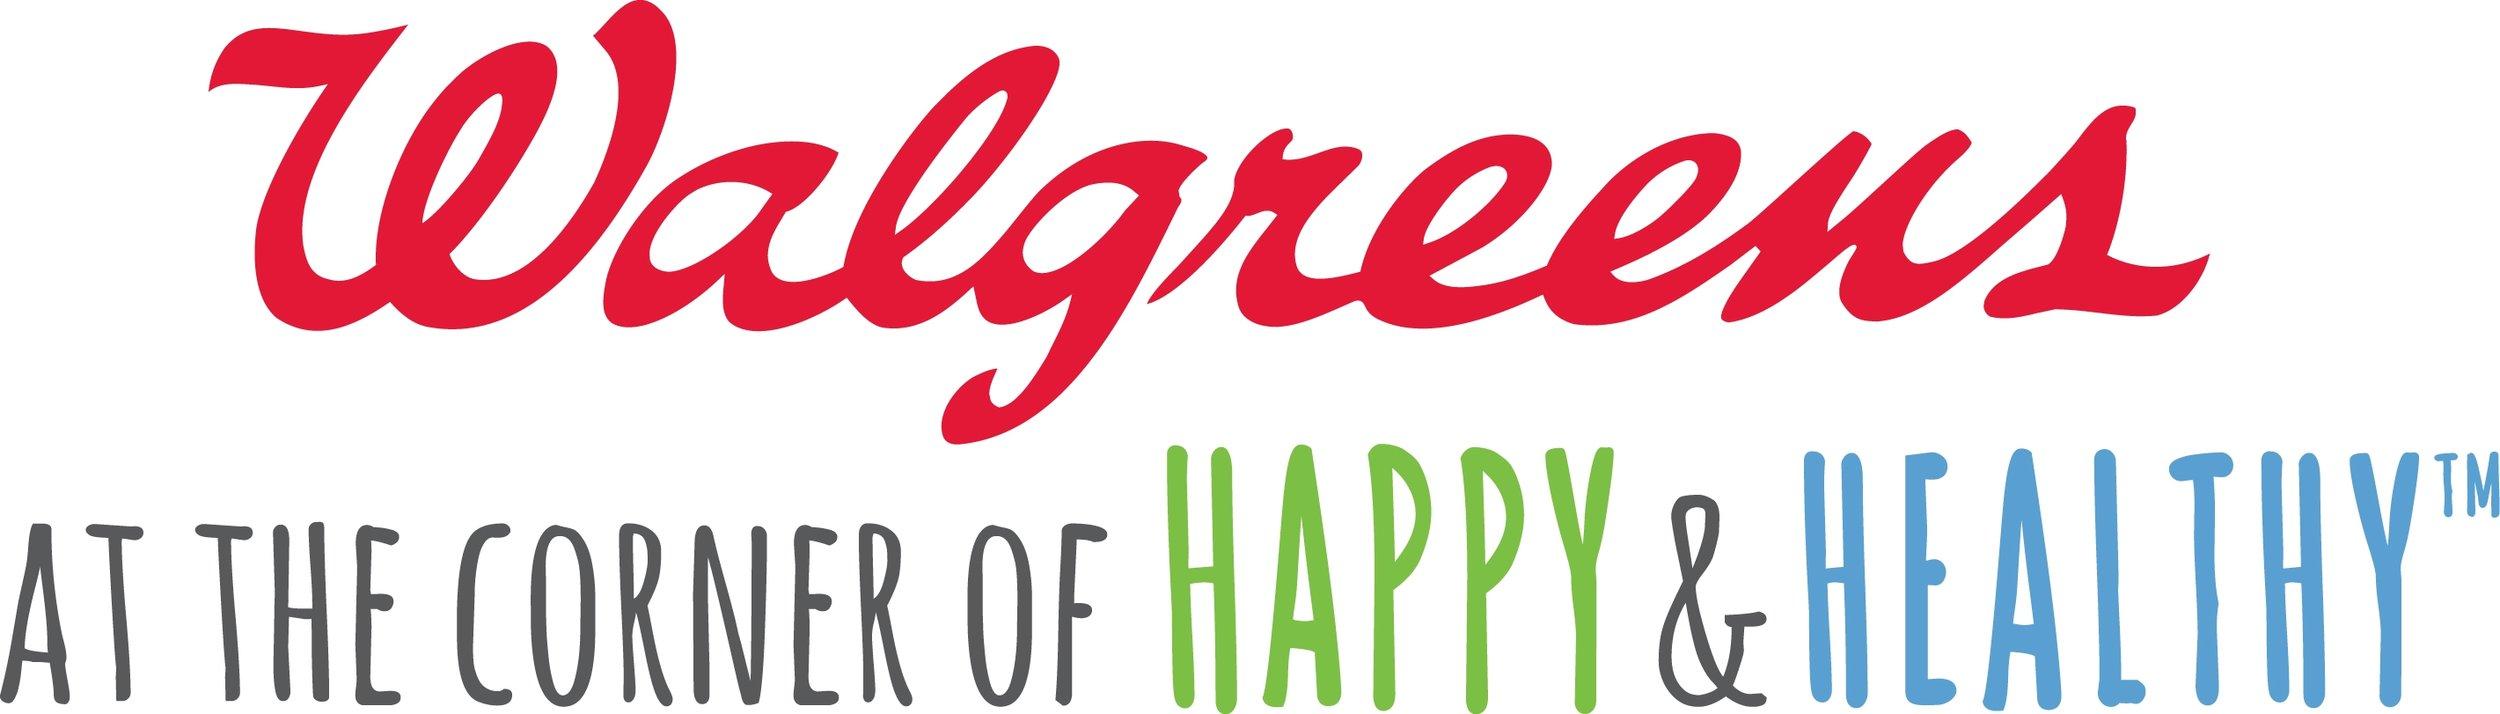 Walgreens_happy_healthy logo.jpg